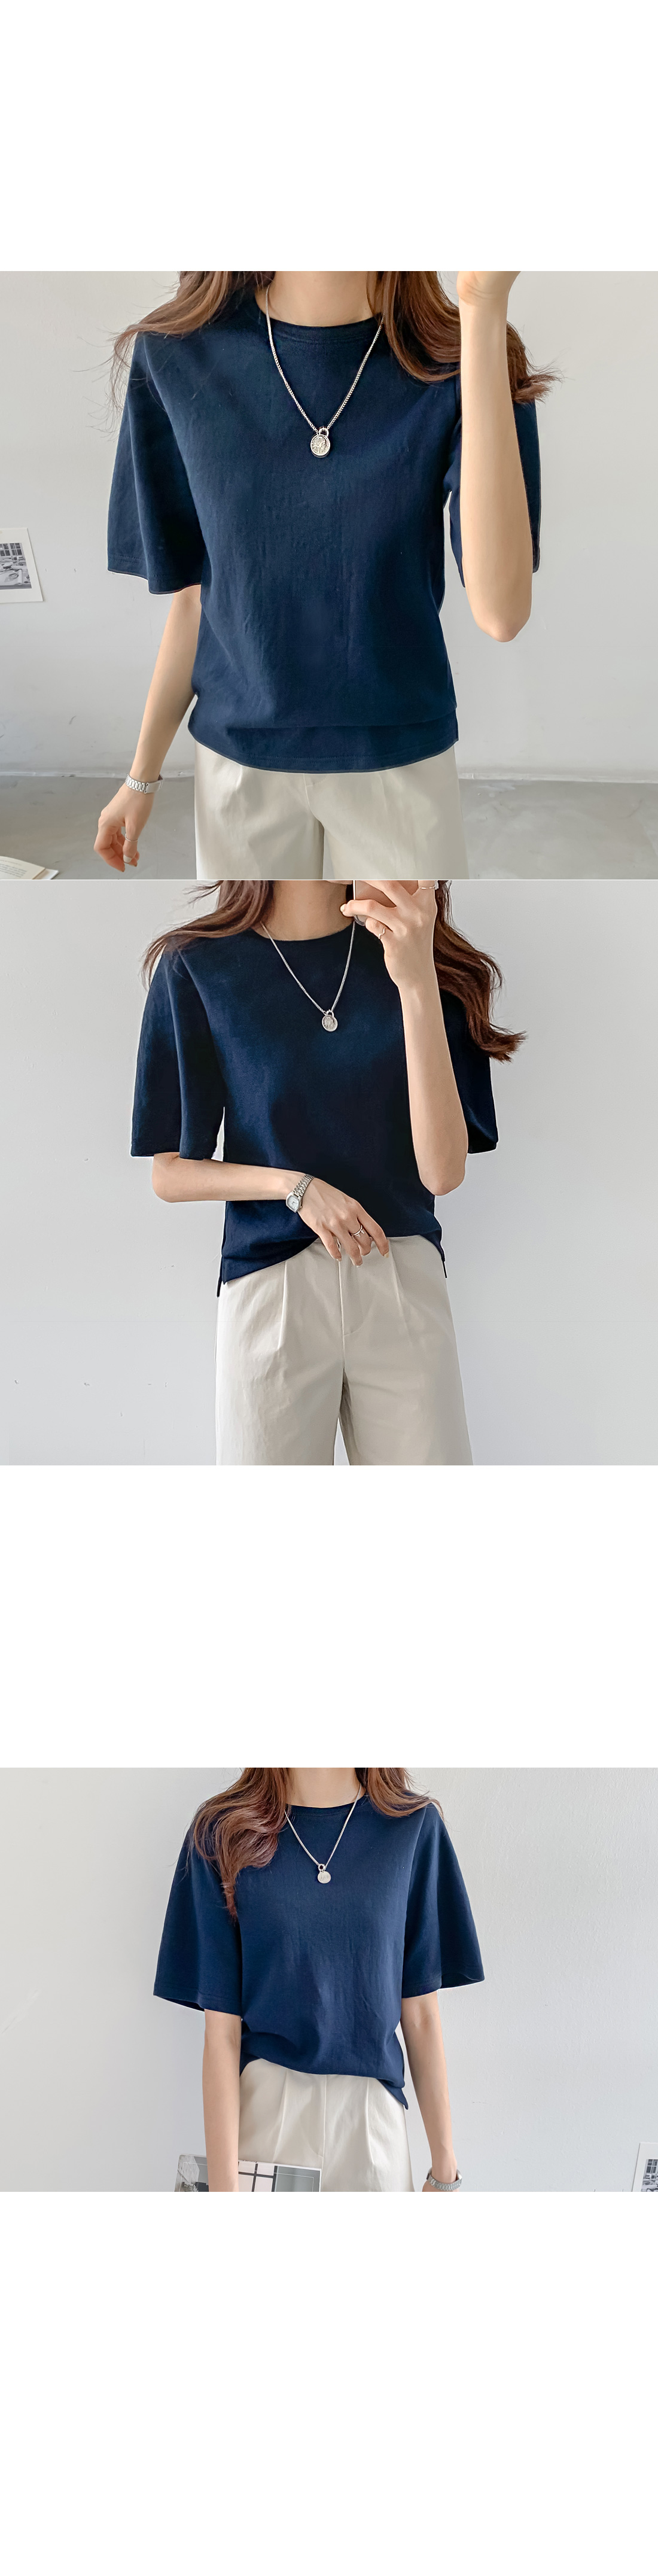 Tencel Round Short Sleeve Tee #106991